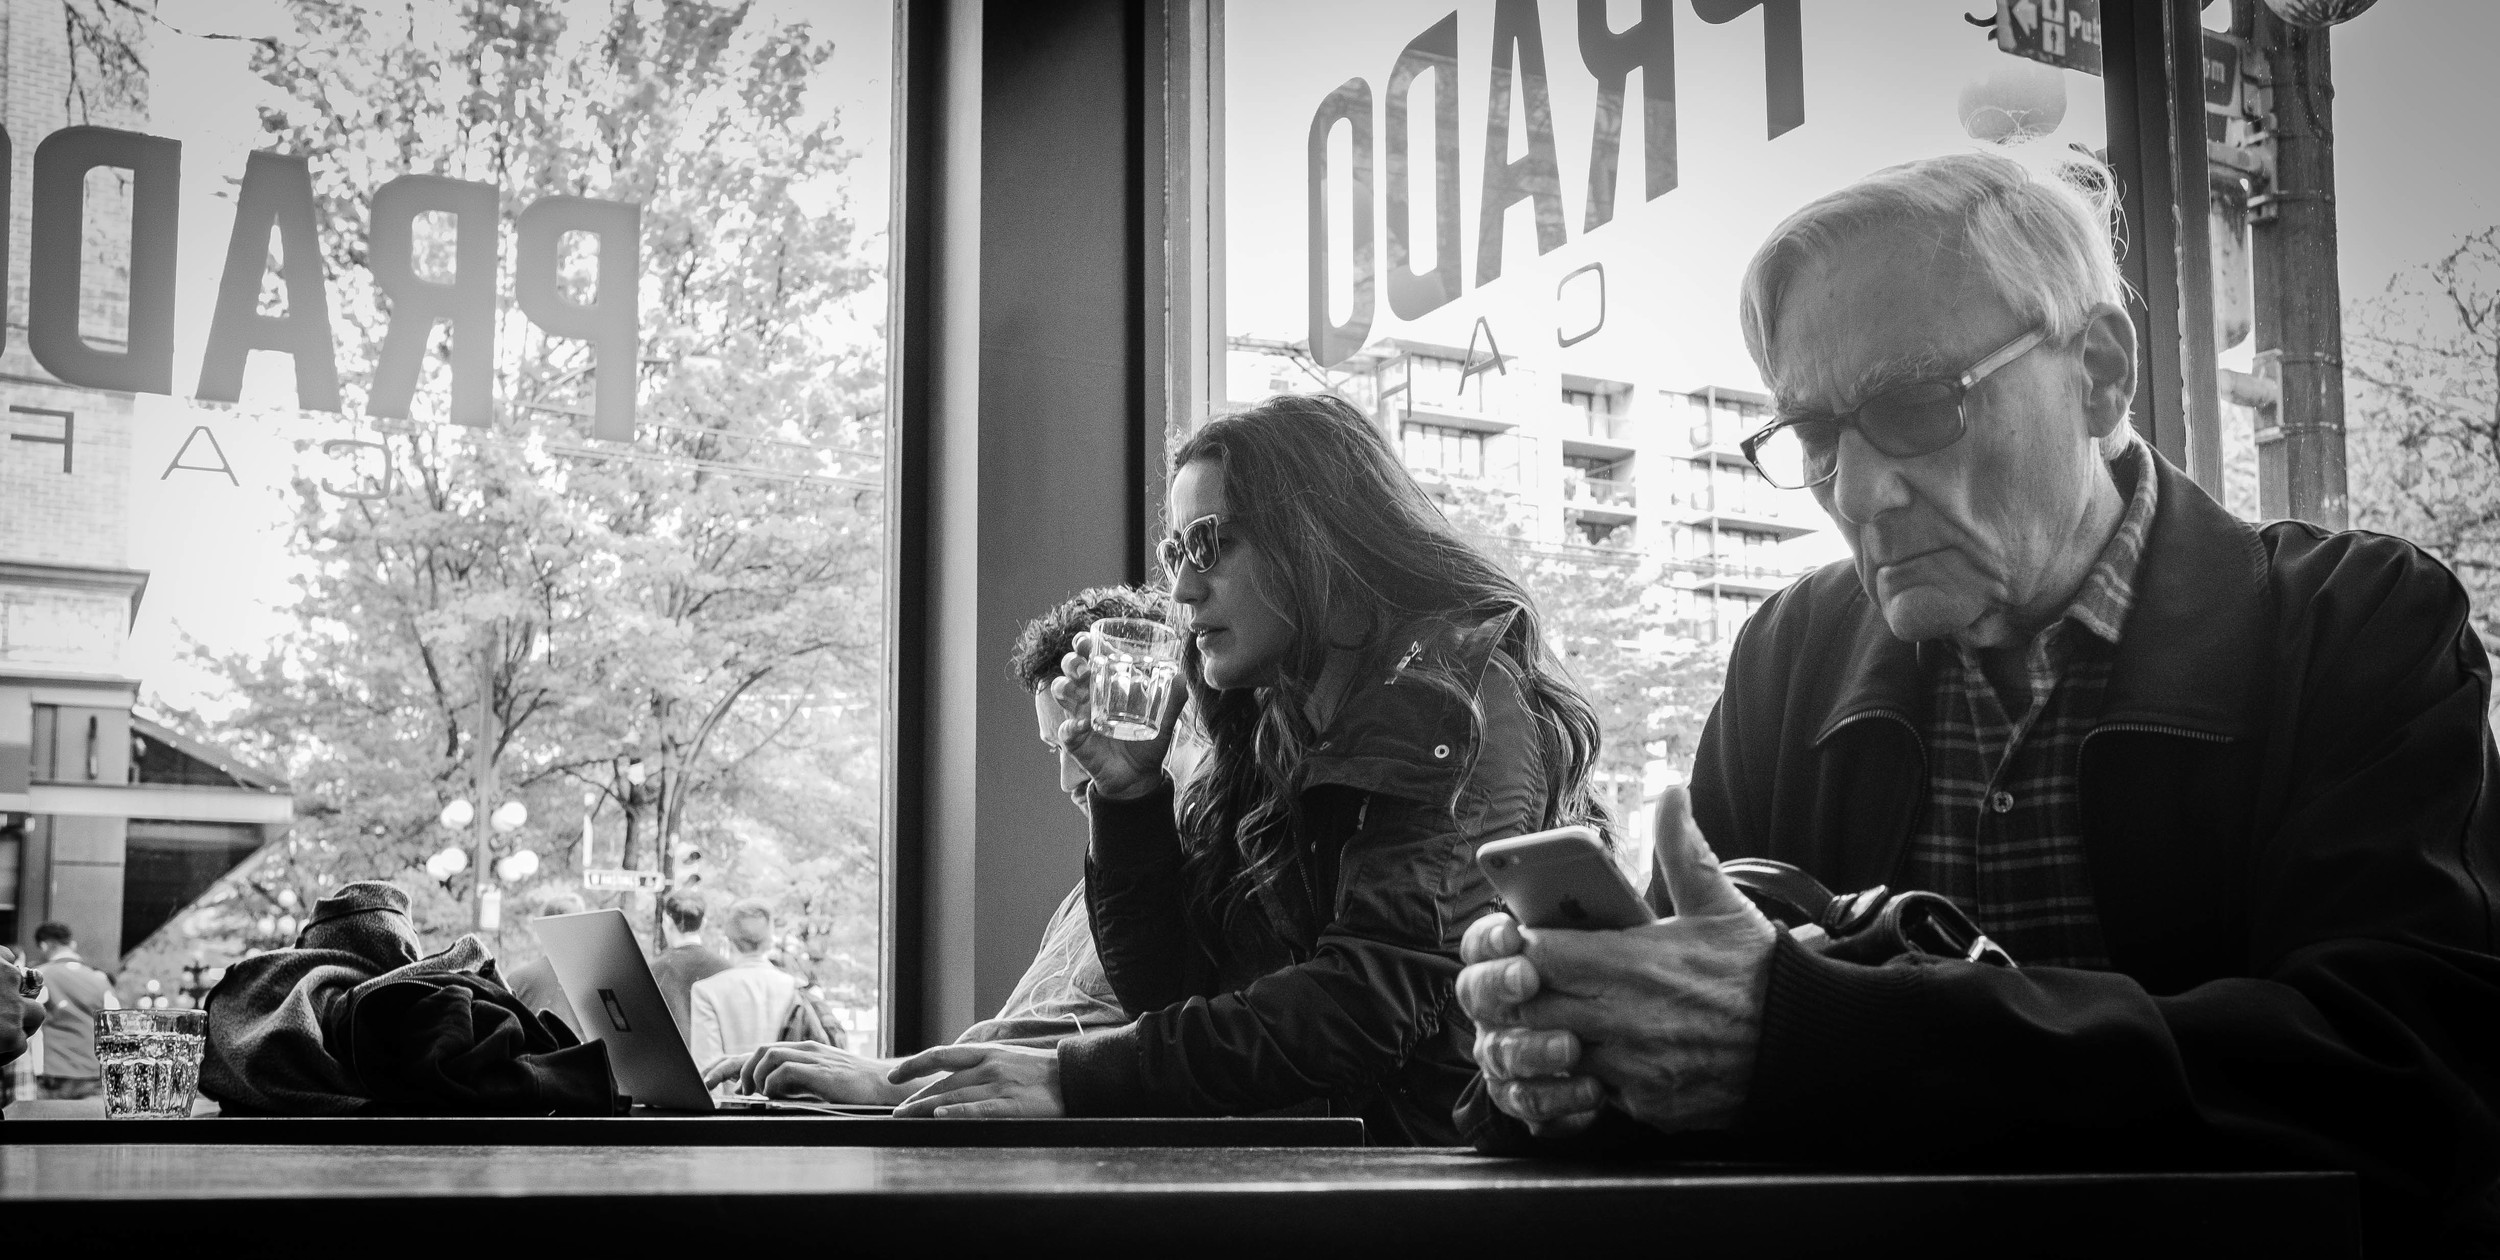 Prado Cafe Gastown, Vancouver Fuji X100T 4.16